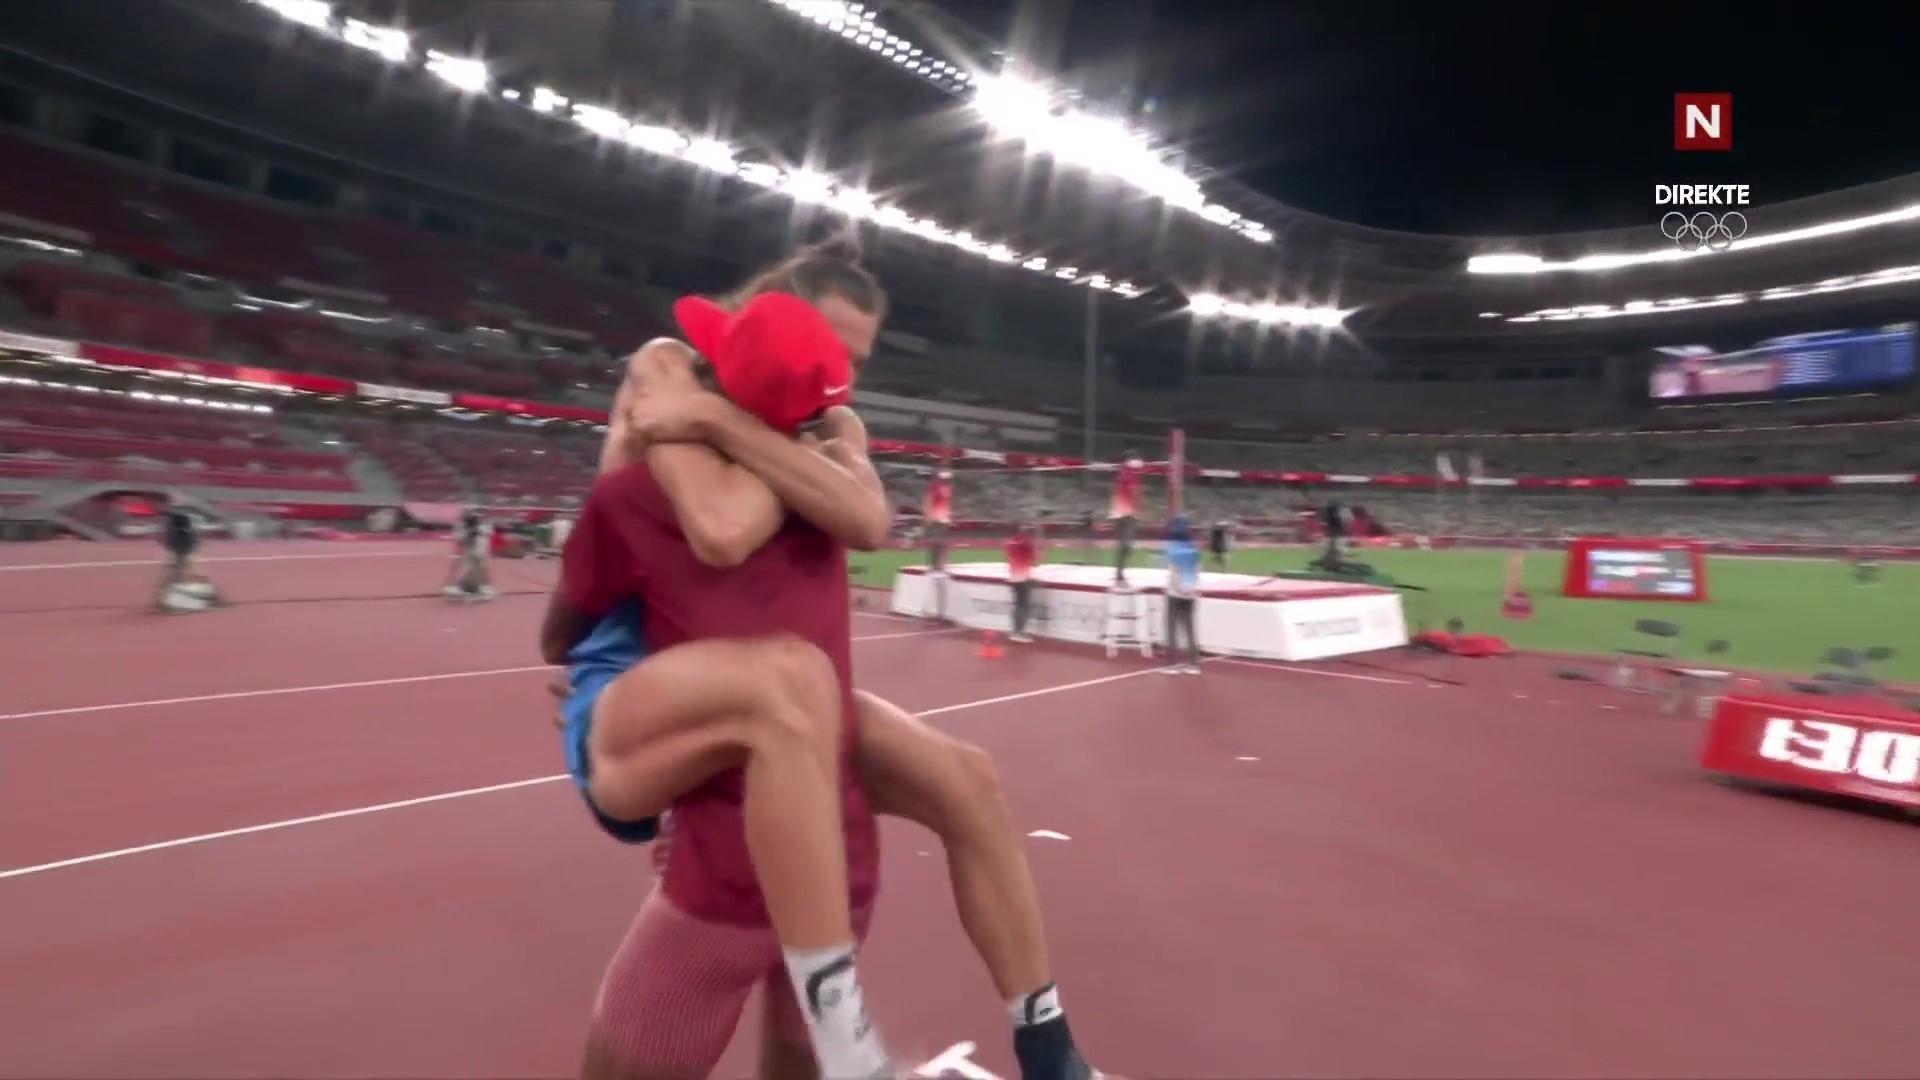 https://i.eurosport.com/2021/08/01/3190289.jpg